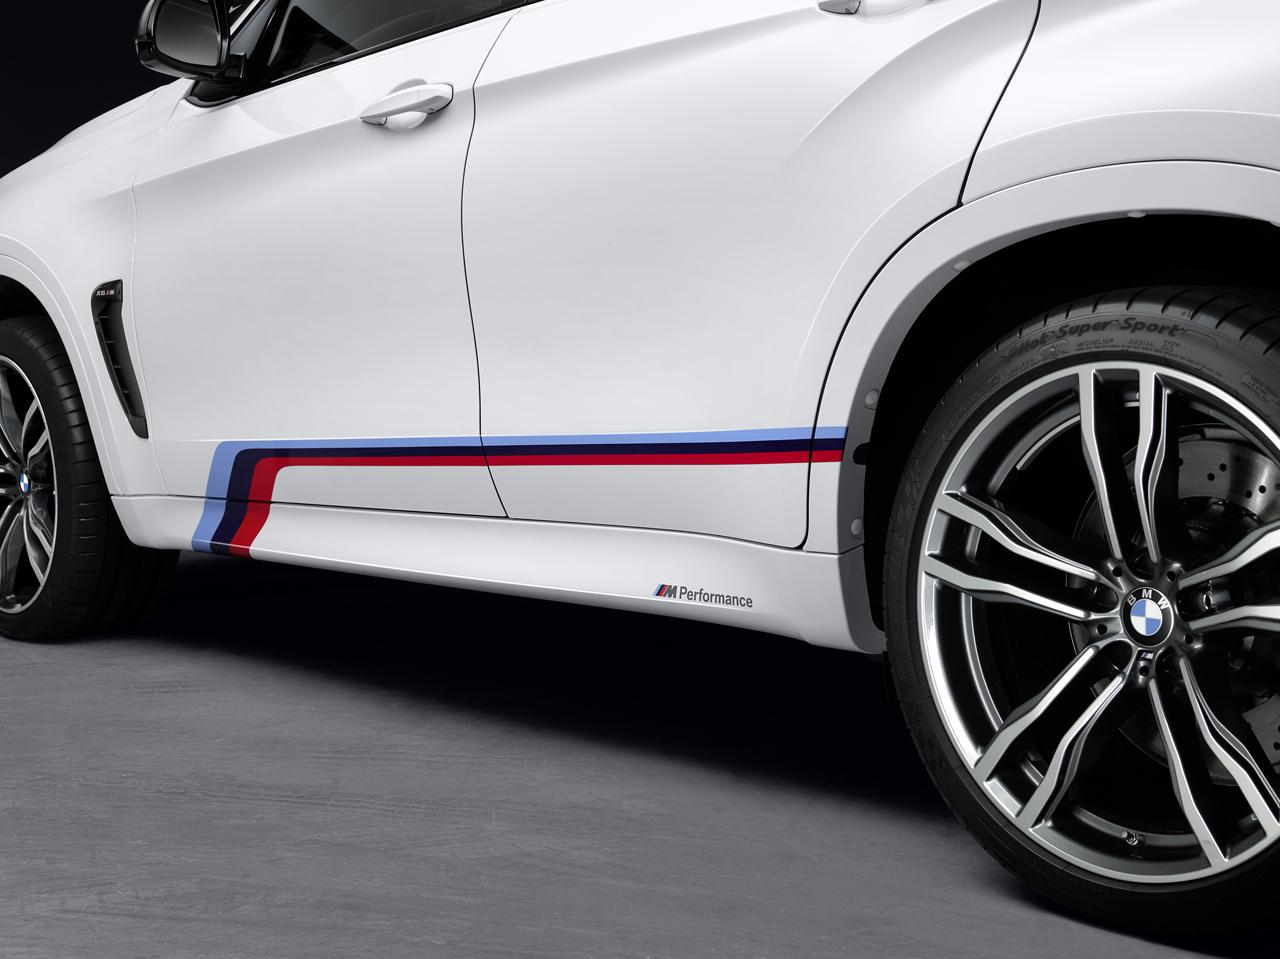 Foto de BMW X5 M y BMW X6 M por M Performance (13/20)